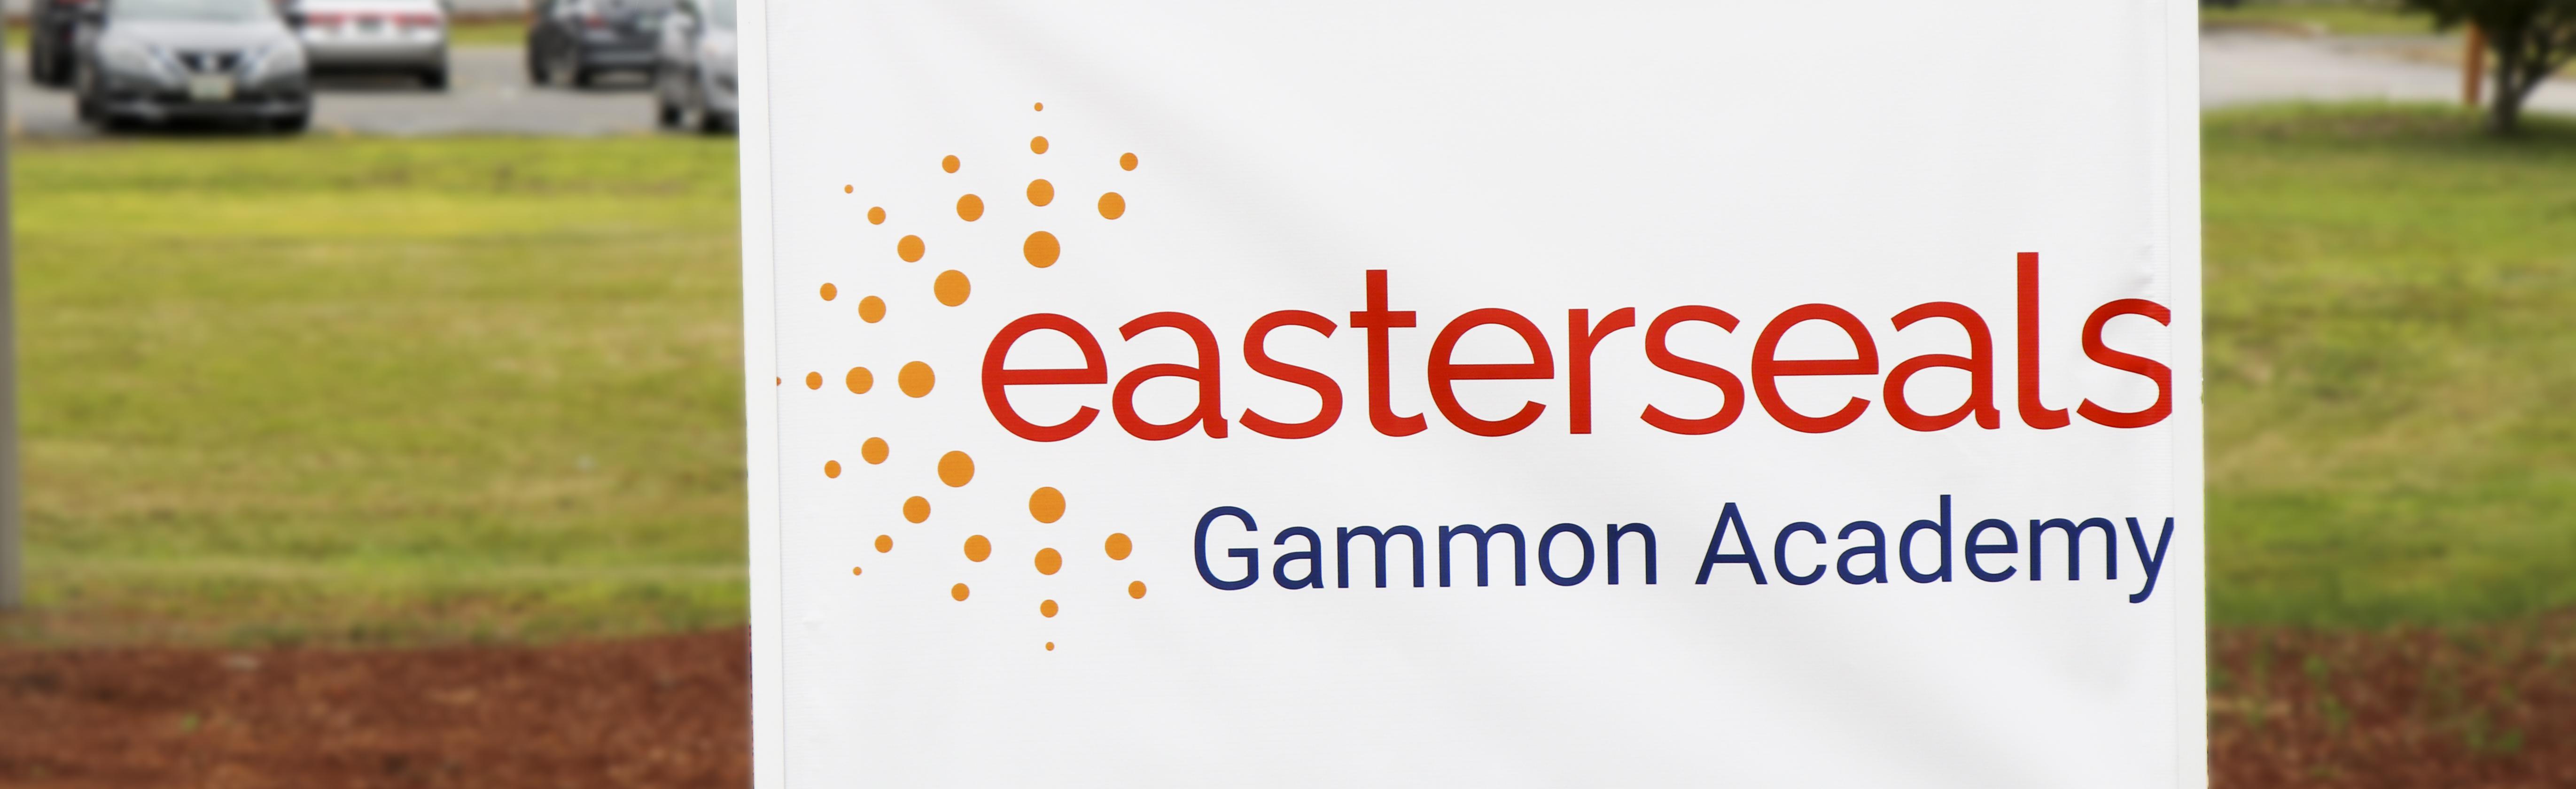 Gammon Academy